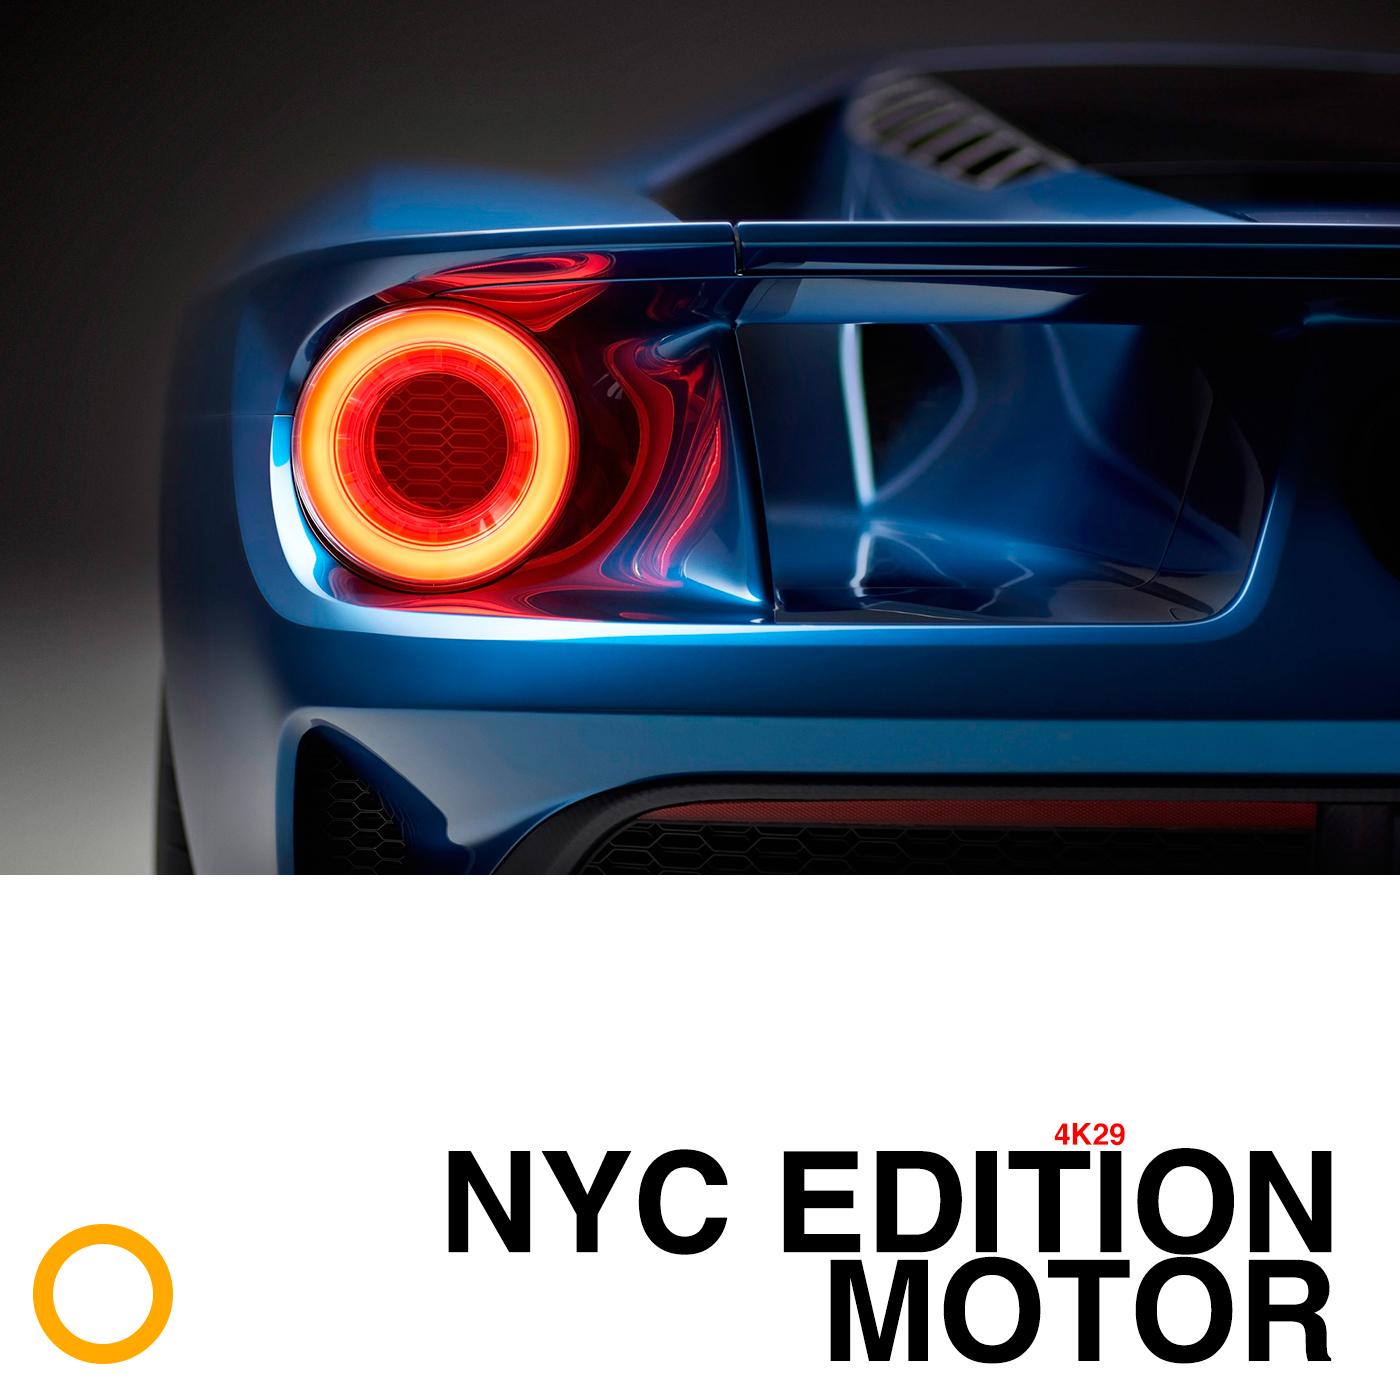 NYC EDITION MOTOR 4K29